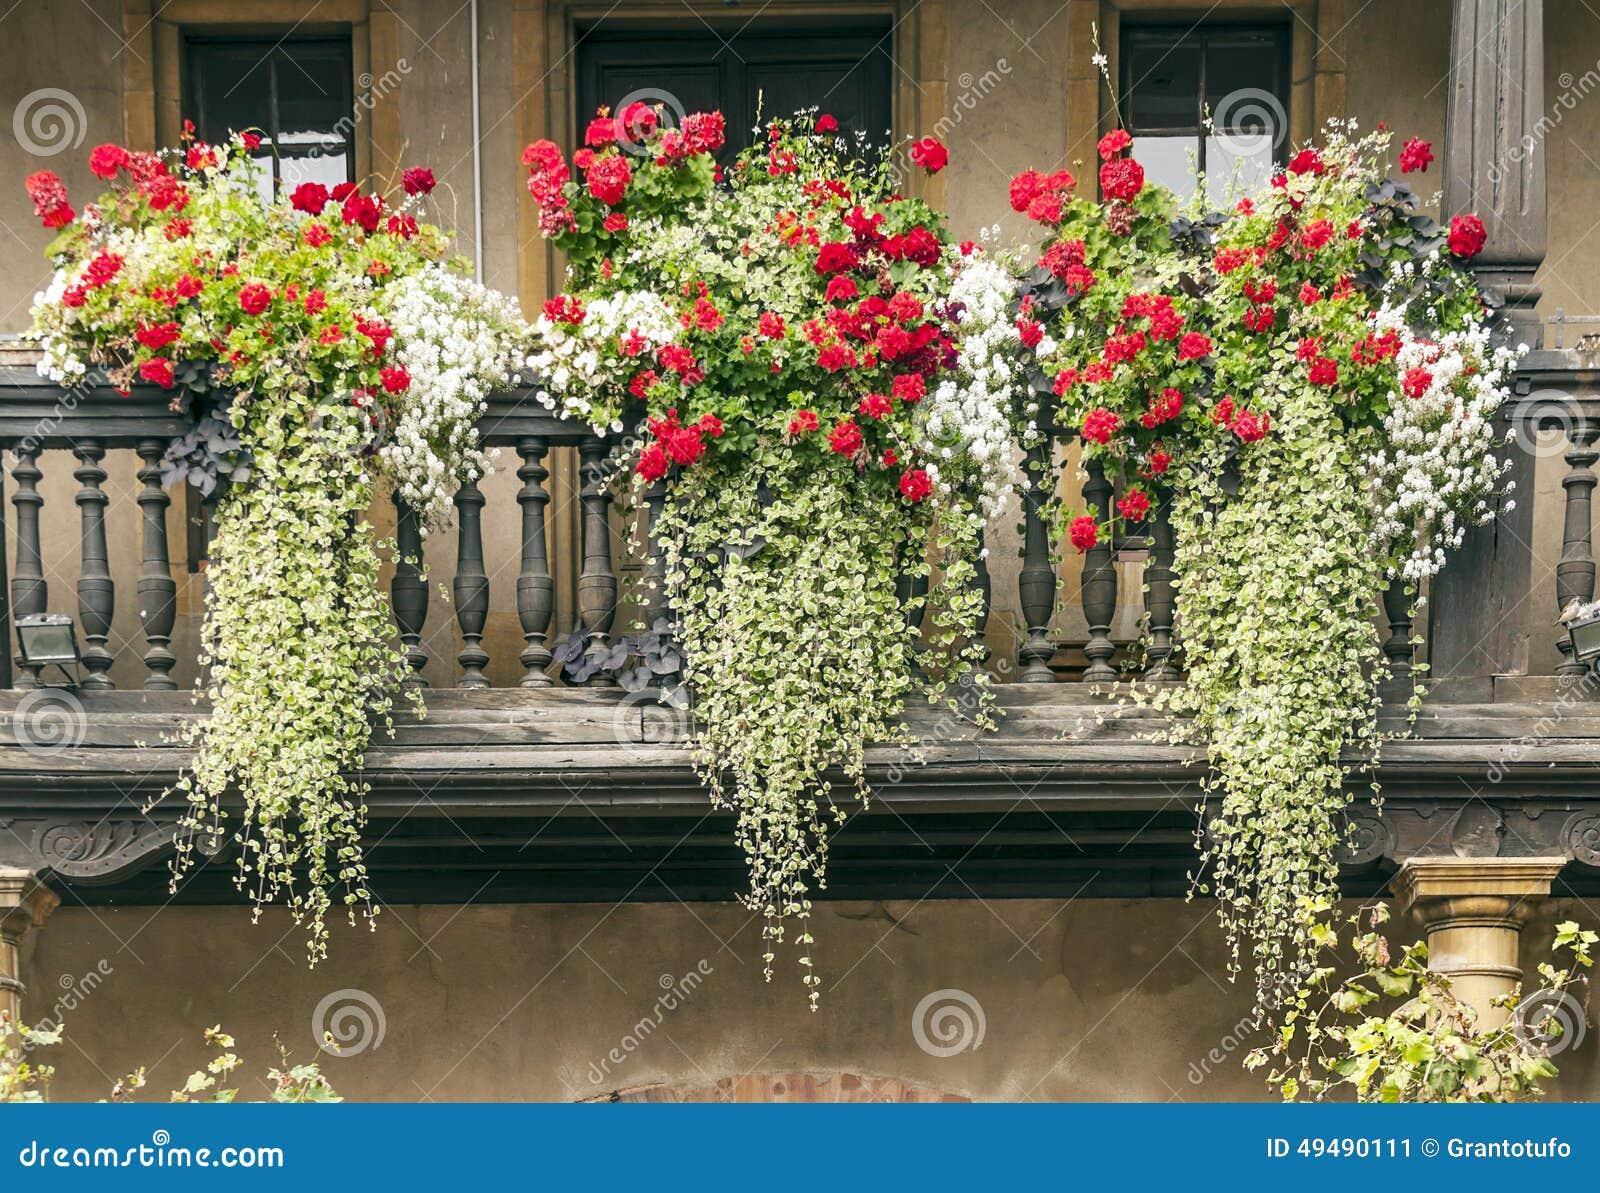 fassade mit balkon stockfoto bild 49490111. Black Bedroom Furniture Sets. Home Design Ideas